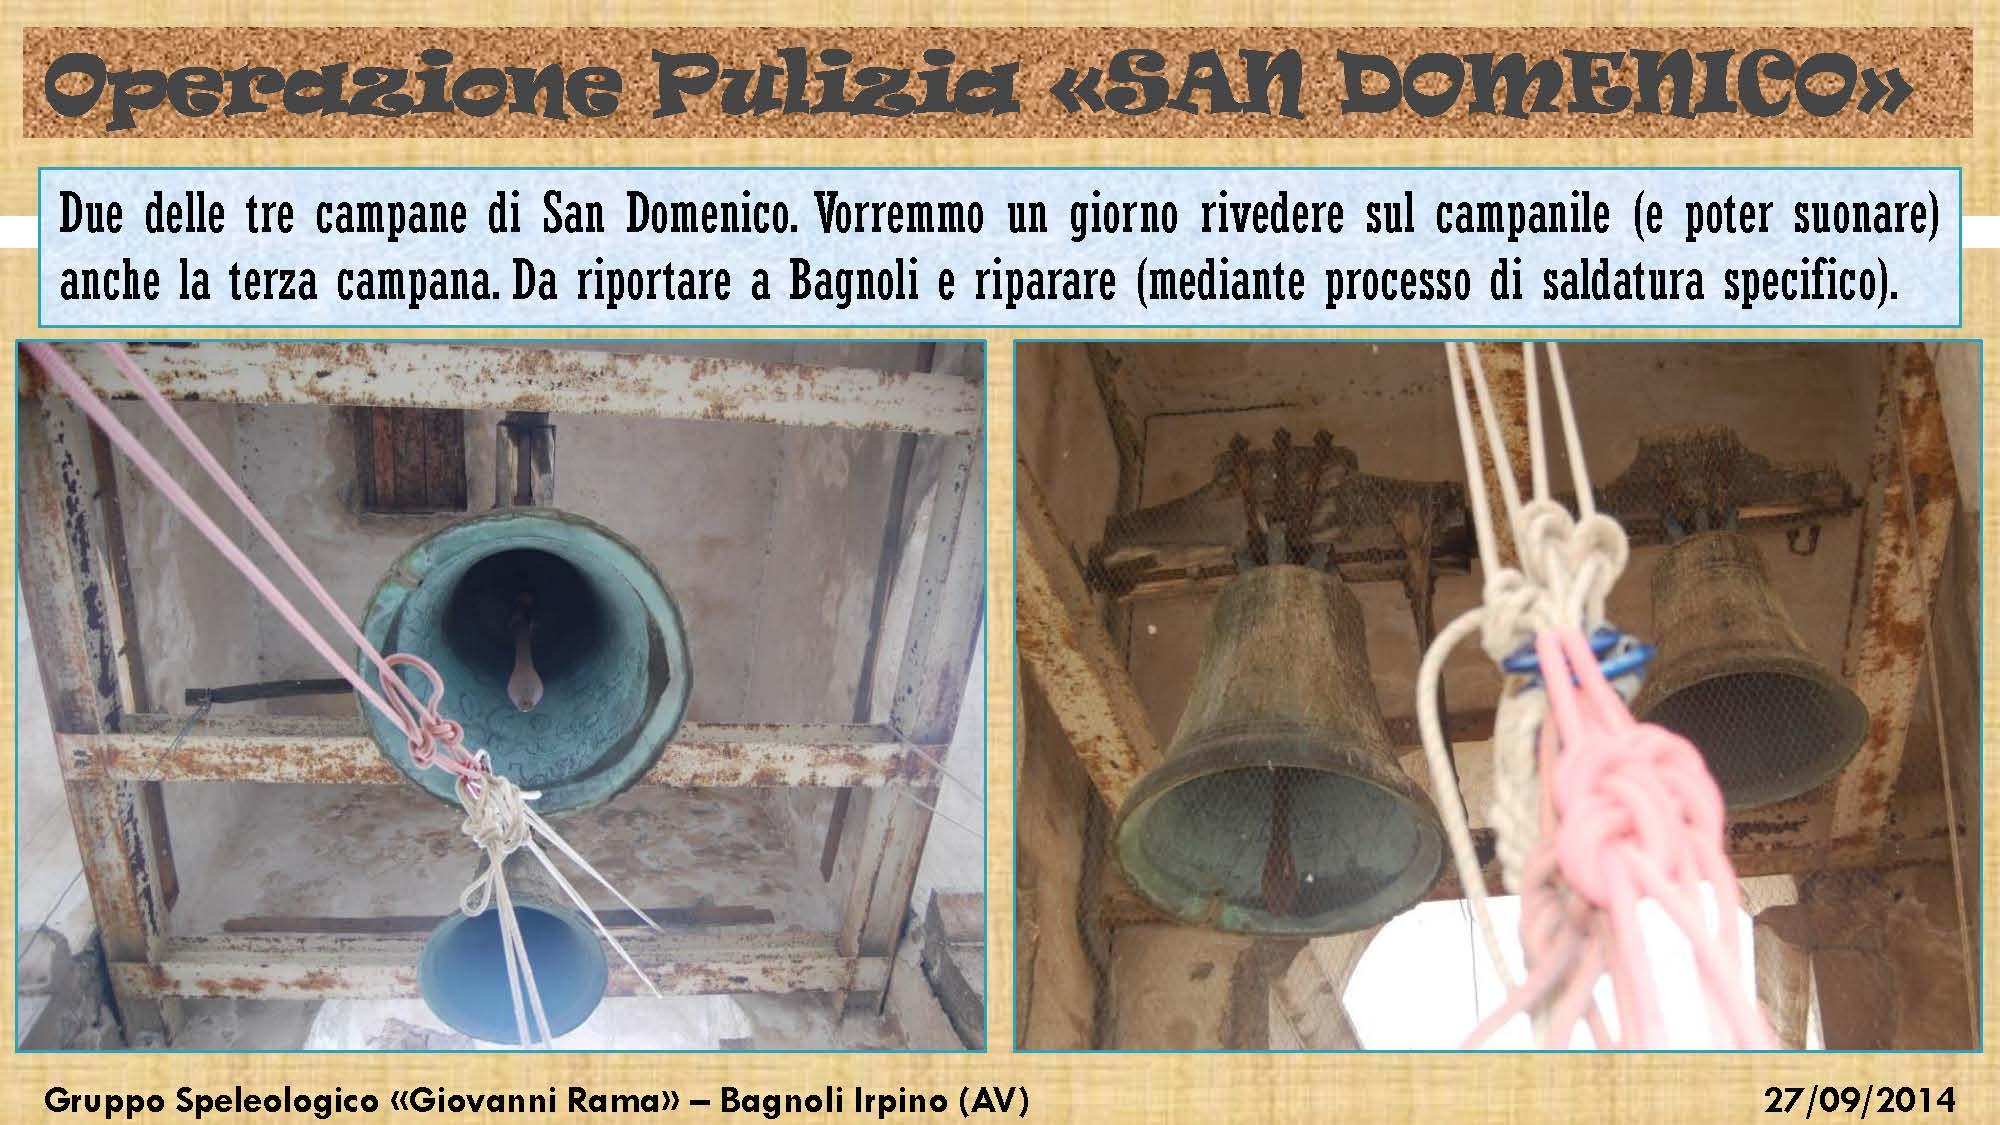 Bagnoli-Pulizia-San-Domenico-2014_Pagina_16